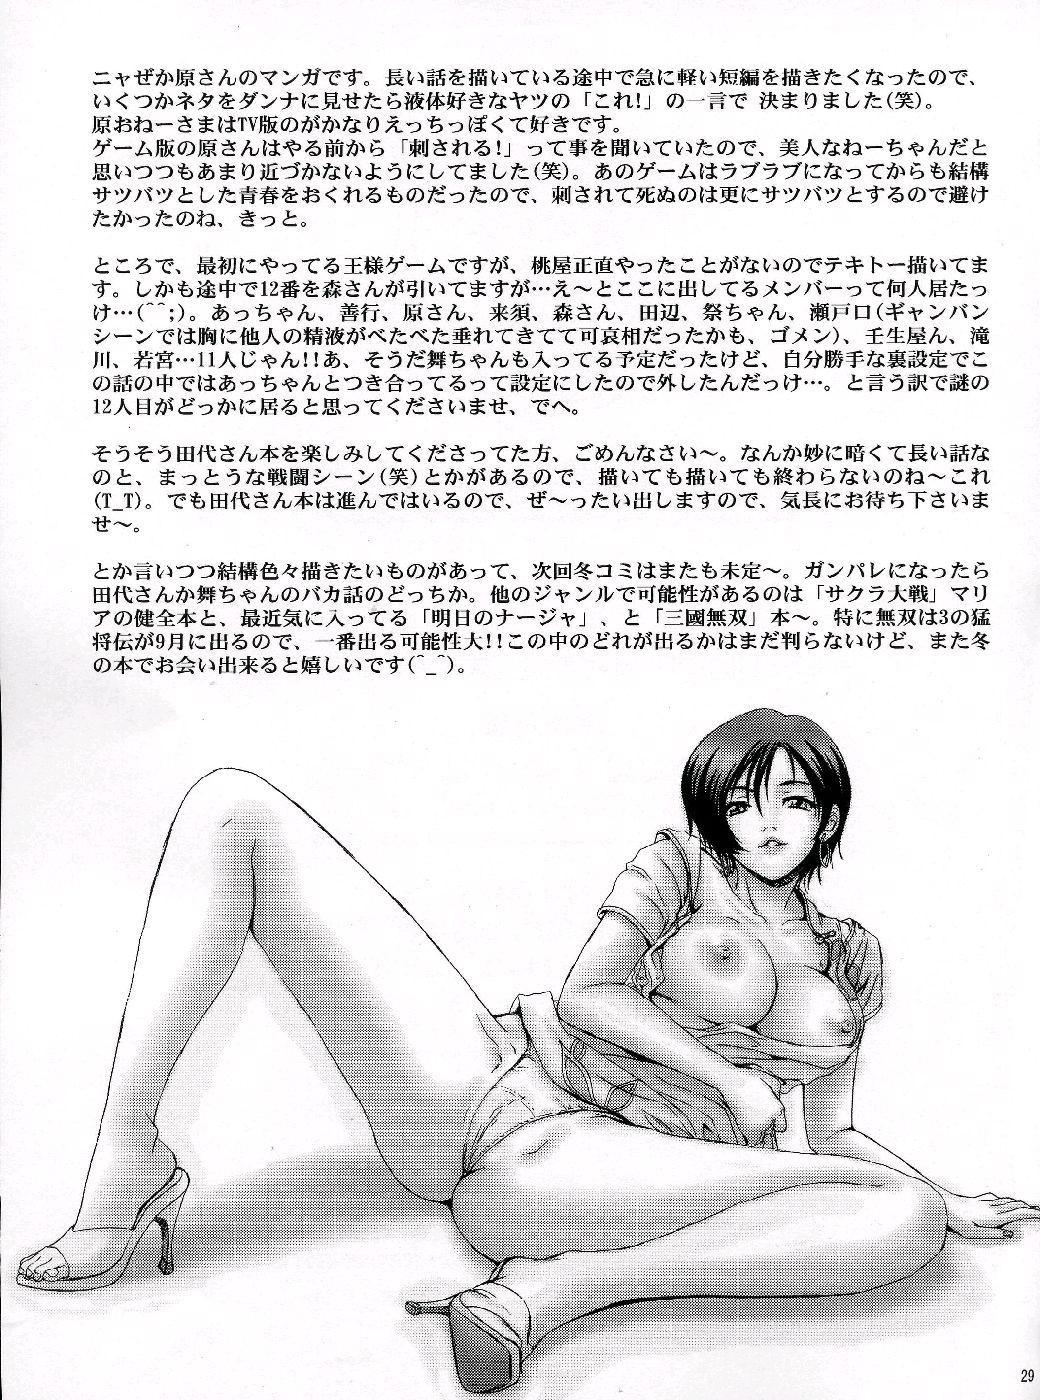 Hakudakueki Gensou Gang Bang March 27